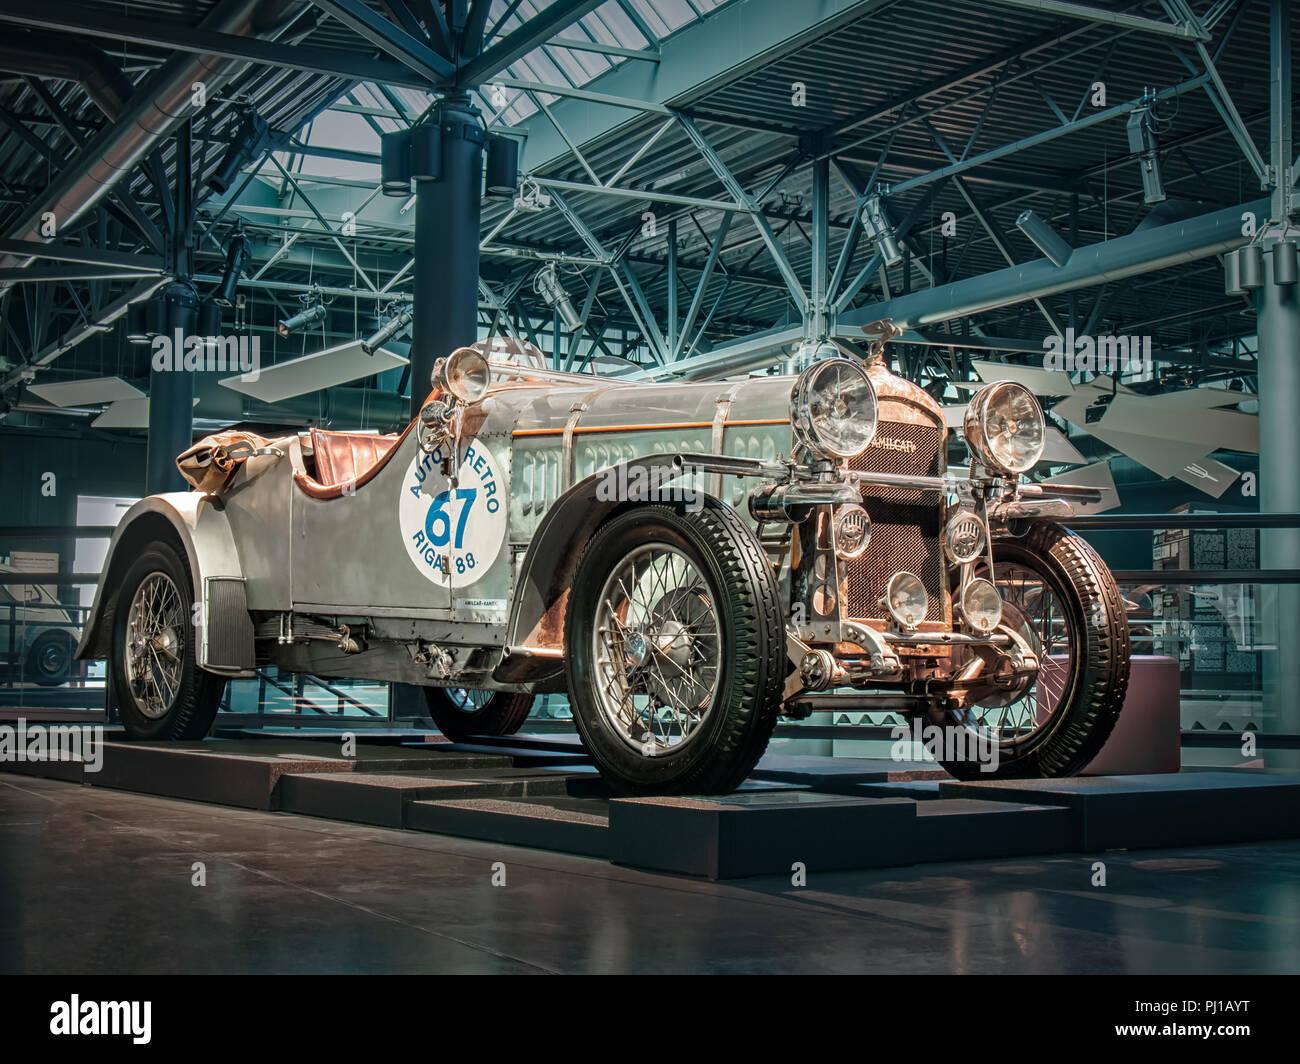 RIGA, LATVIA-APRIL 18, 2018: 1934 Amilcar CGS in the Riga Motor Museum. - Stock Image